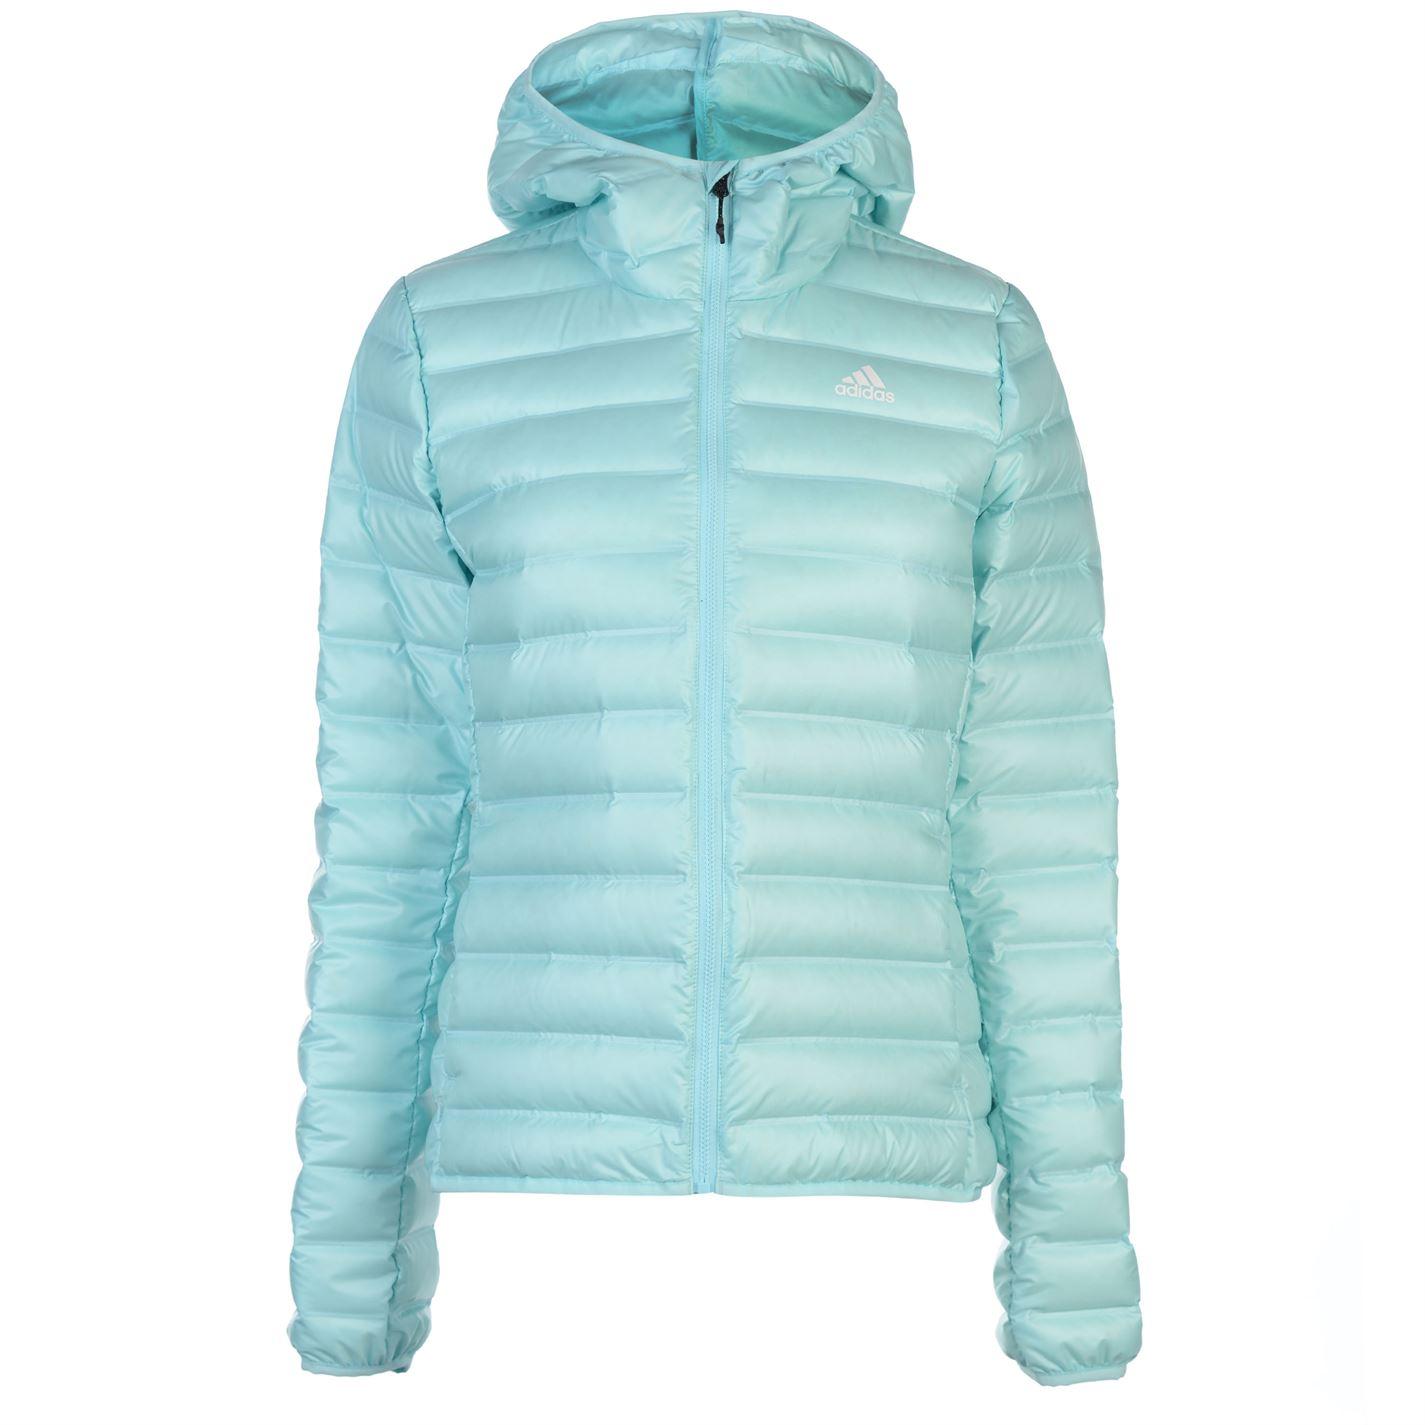 Adidas Varilite Down Jacket Ladies